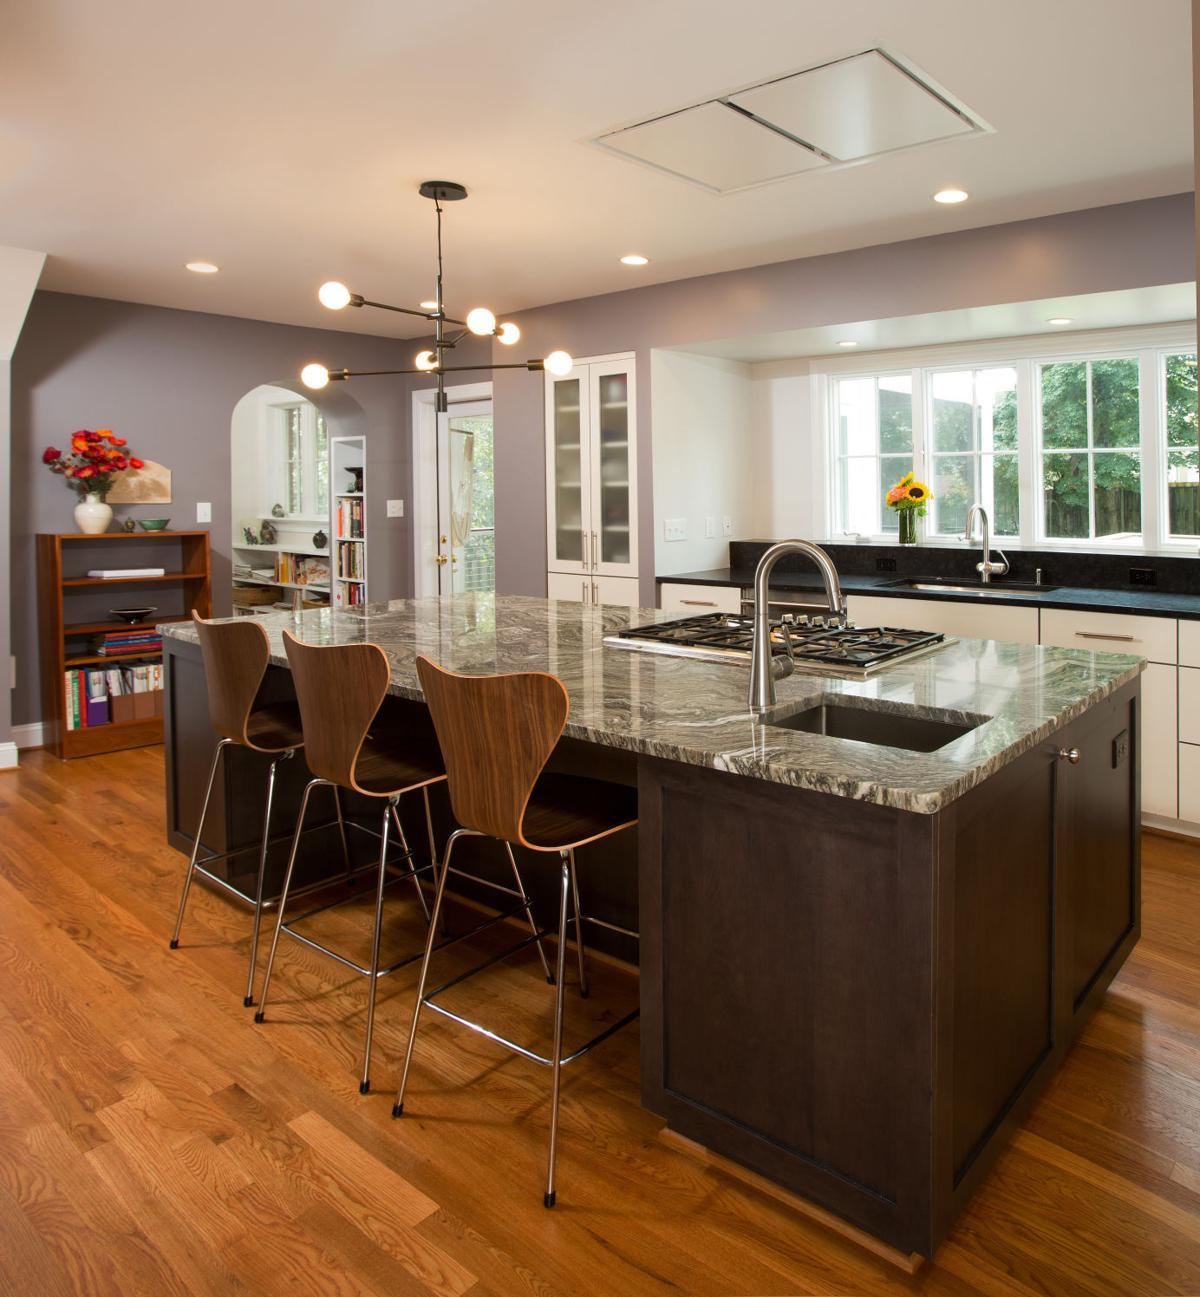 2 renovated kitchen.jpg